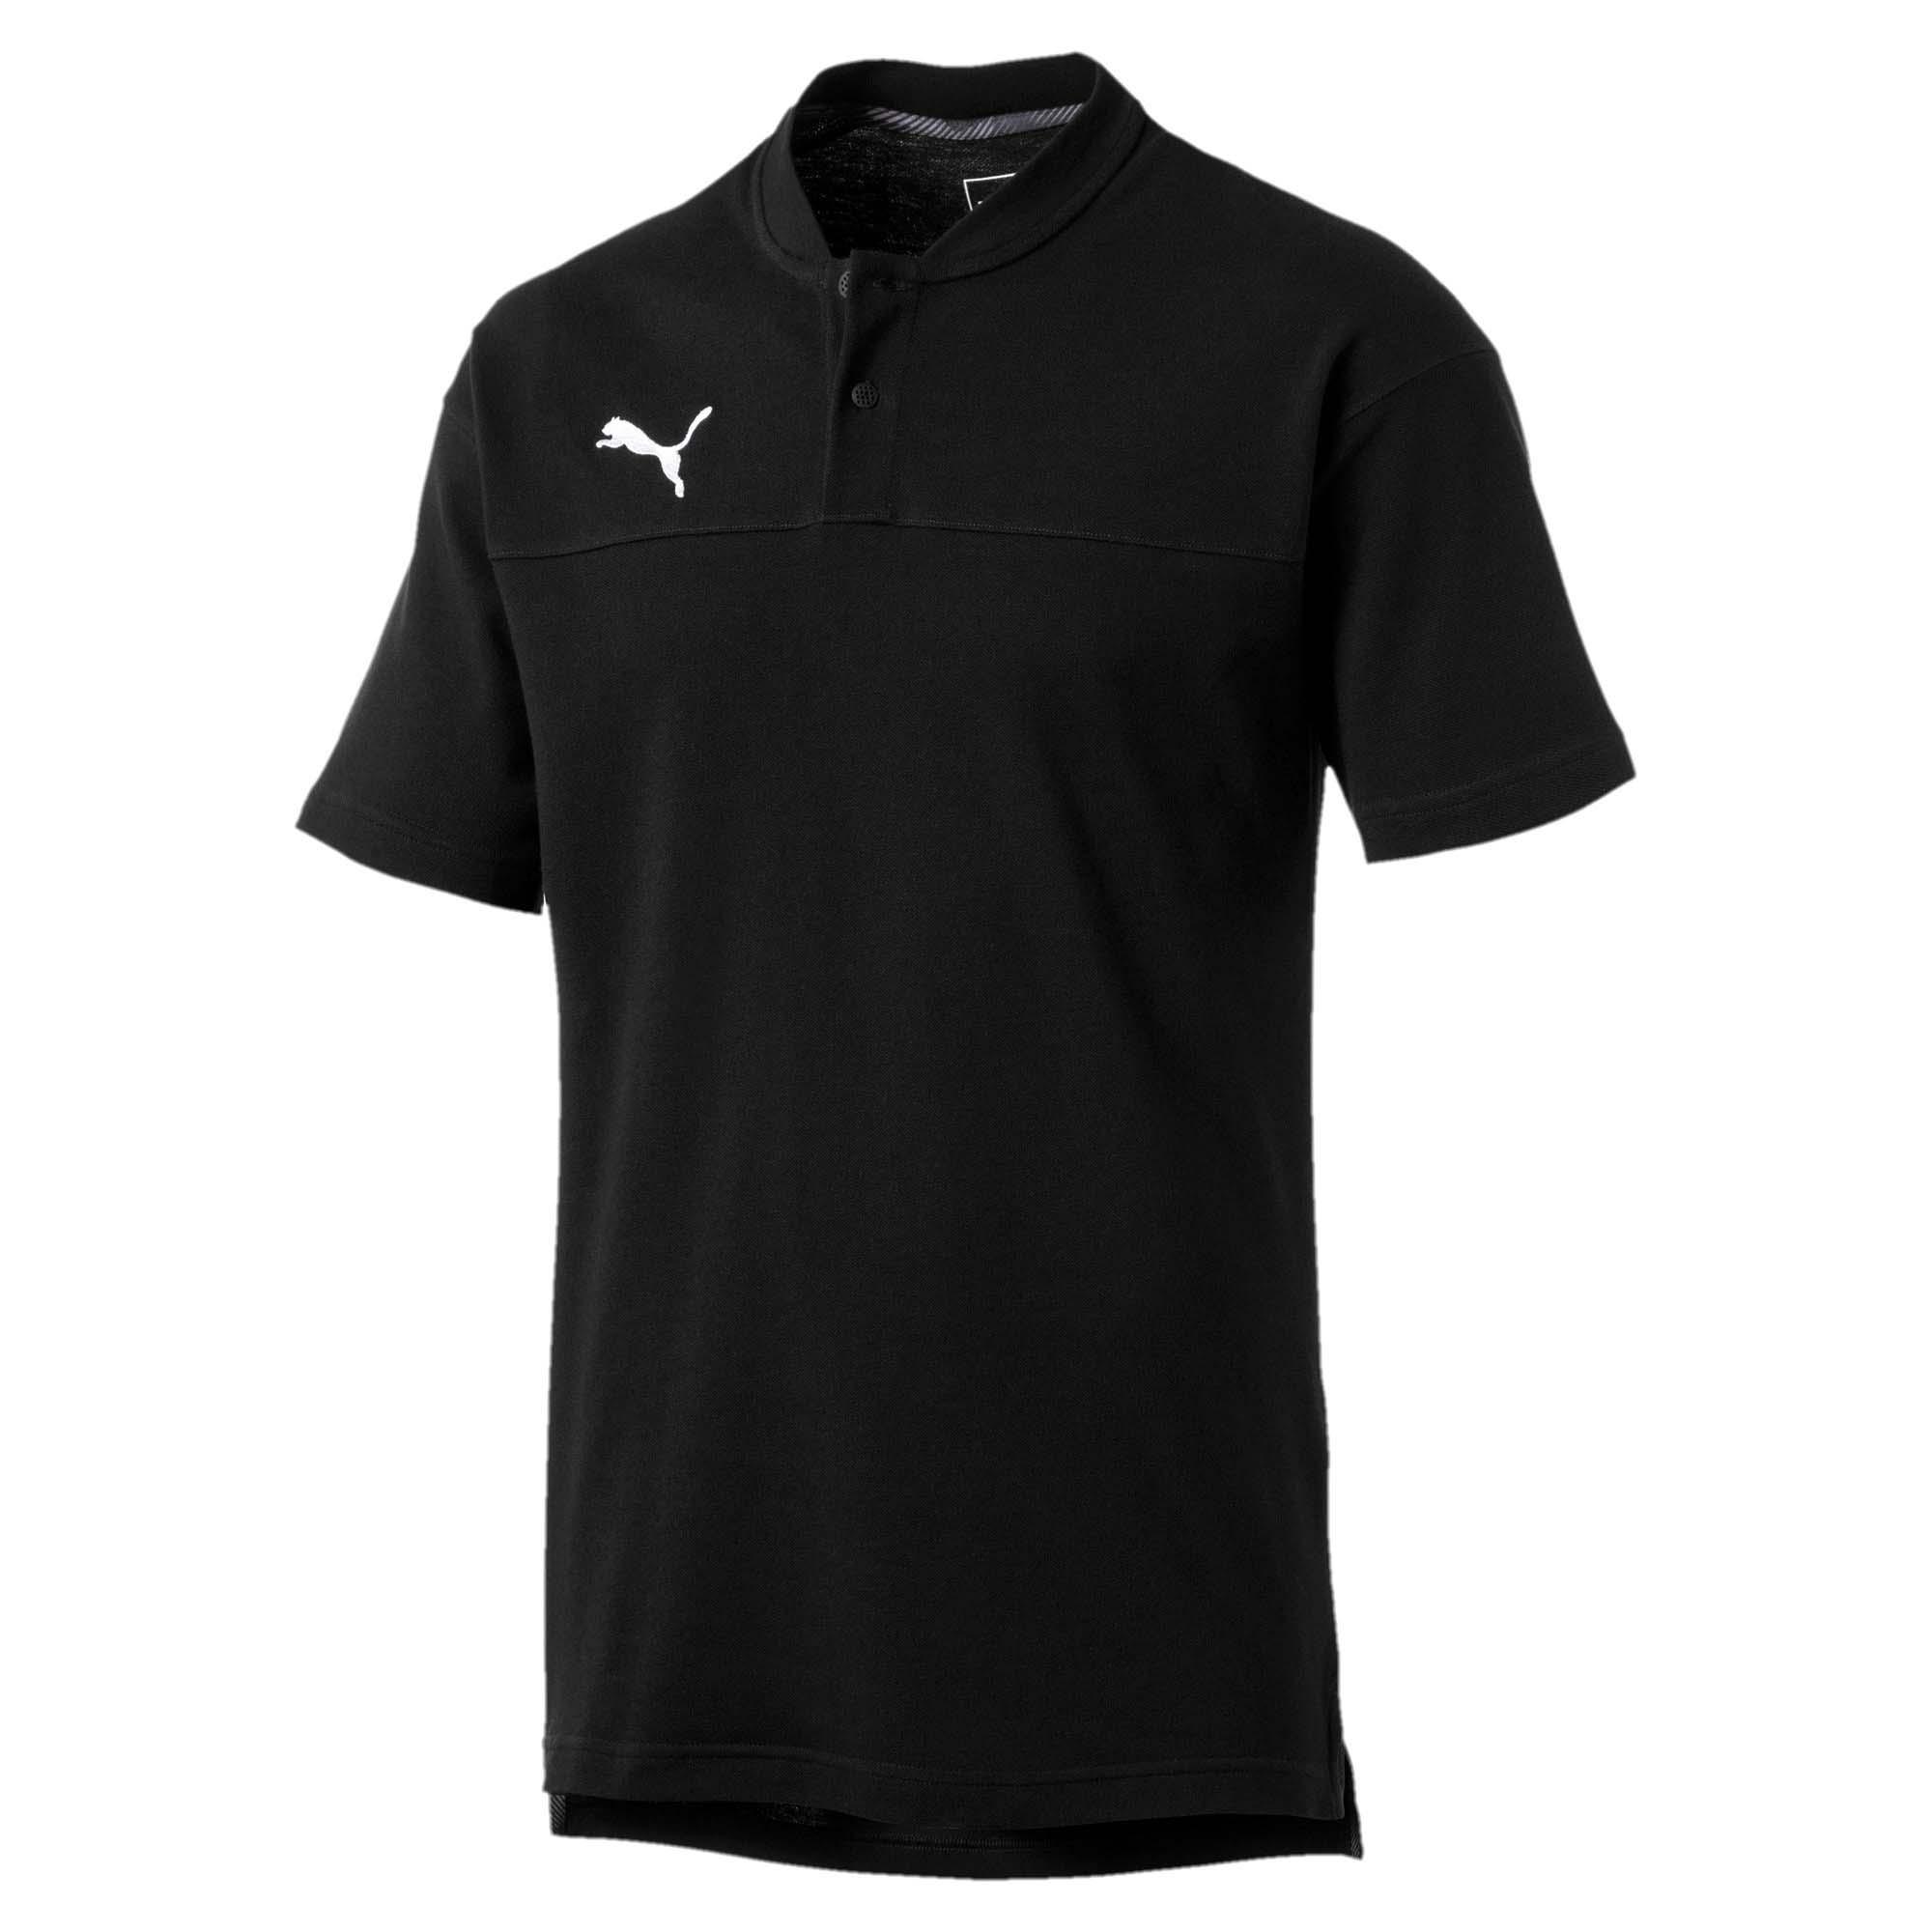 Puma Herren Poloshirt Cup Casual Polo 656036-03 S